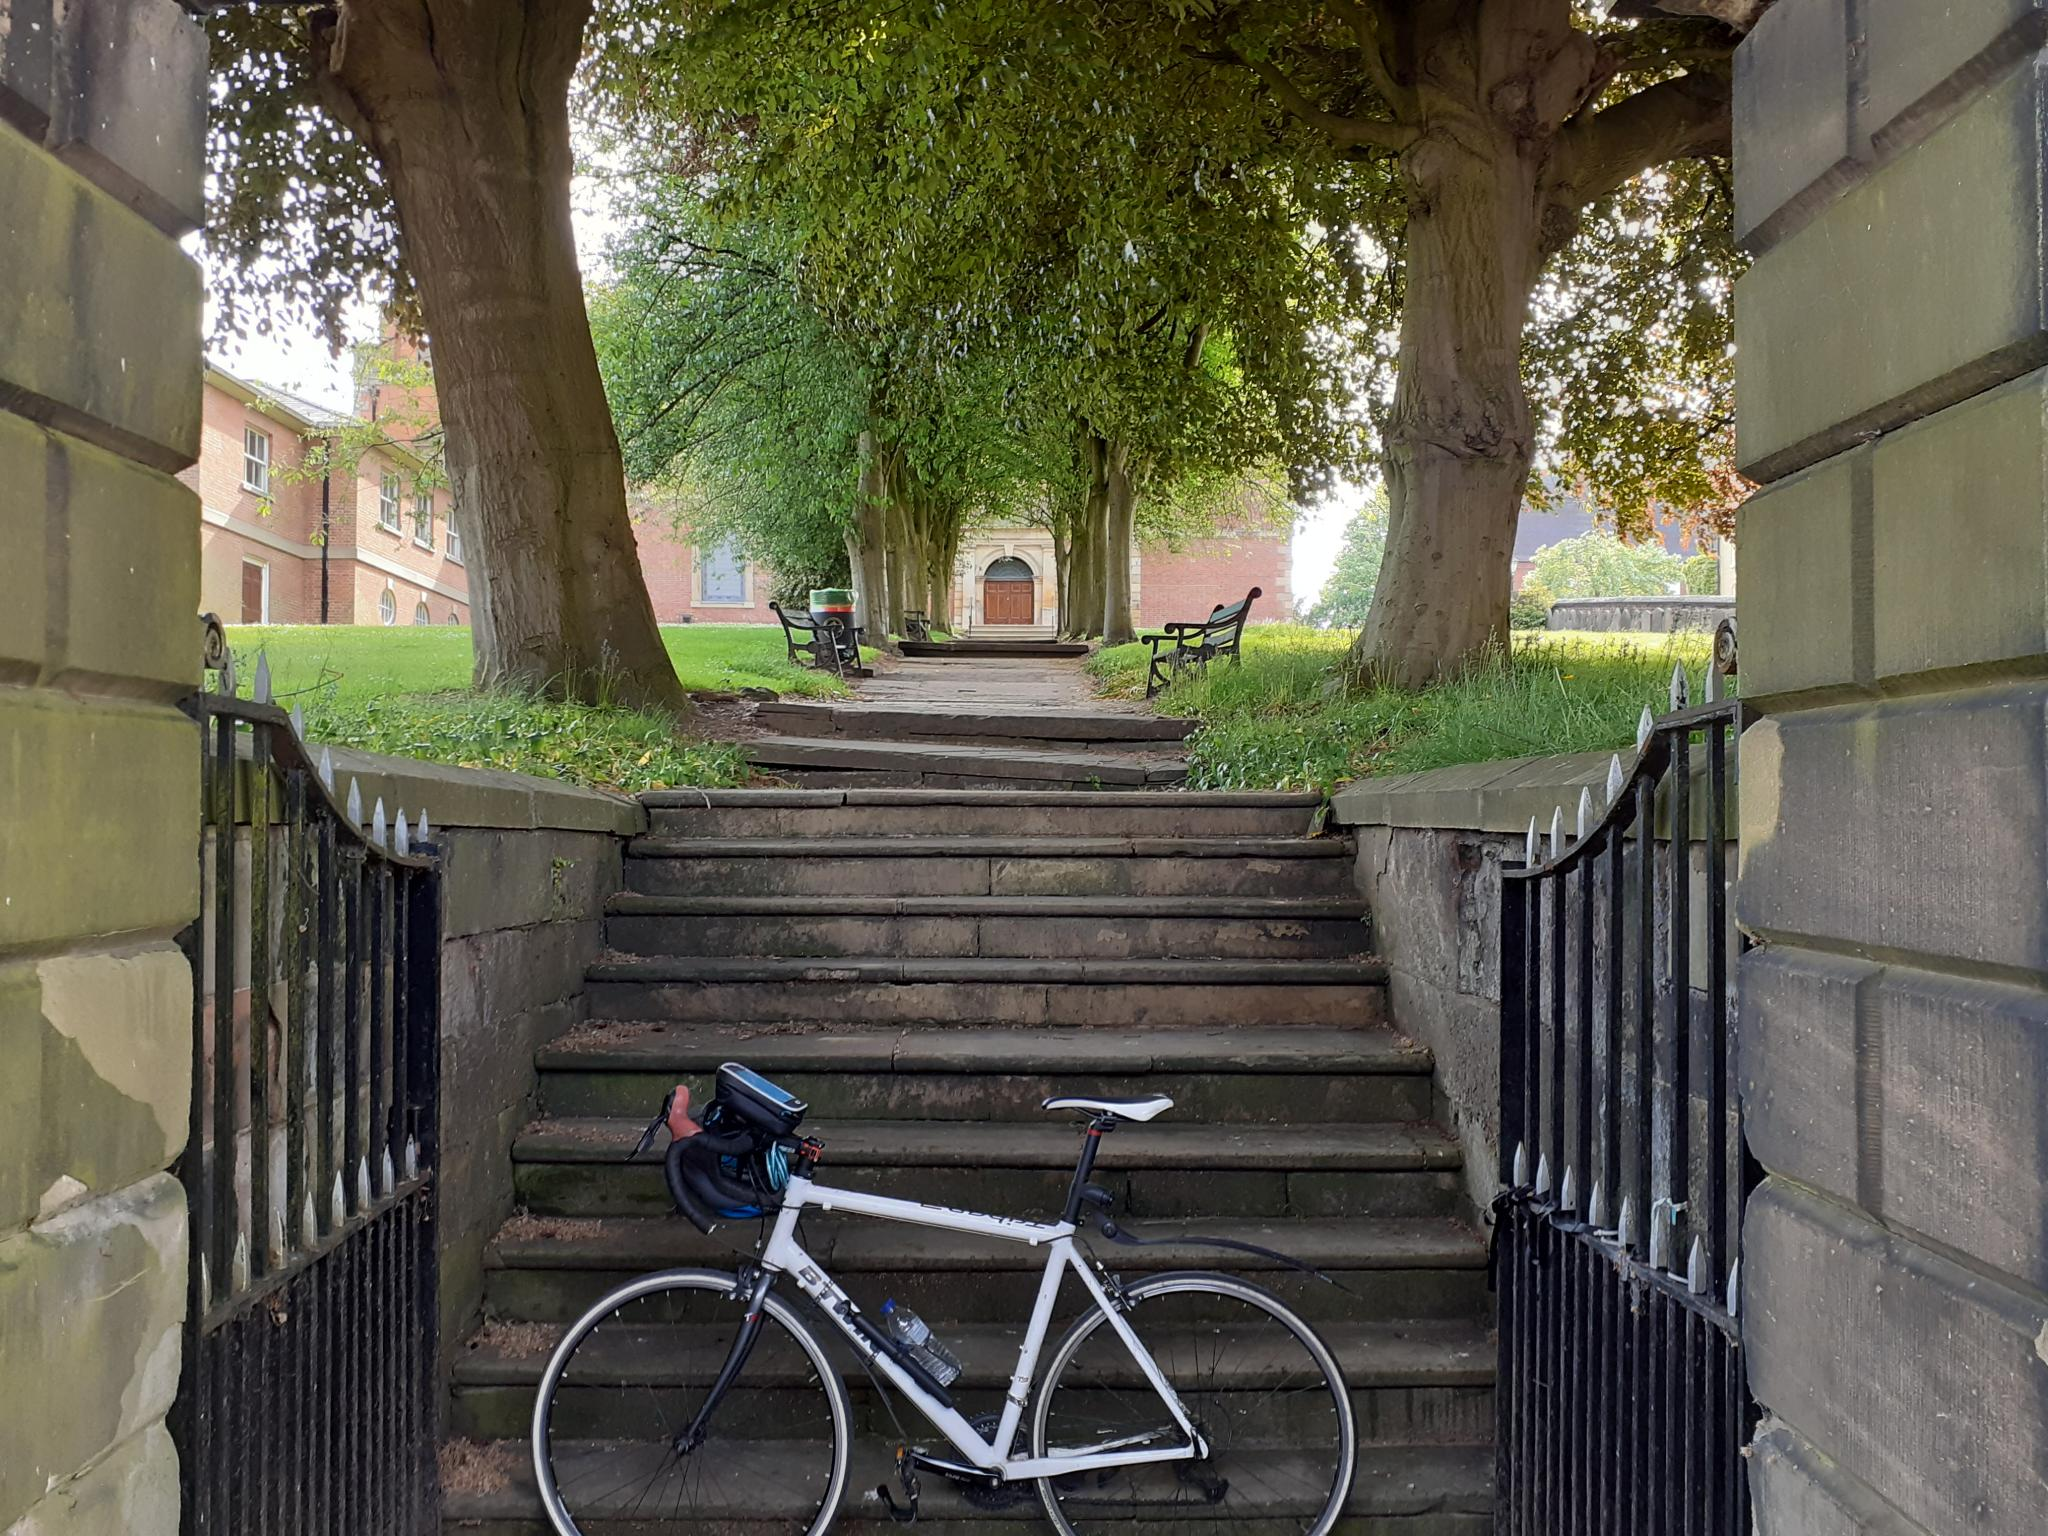 On my bike-20210602_163845-jpg